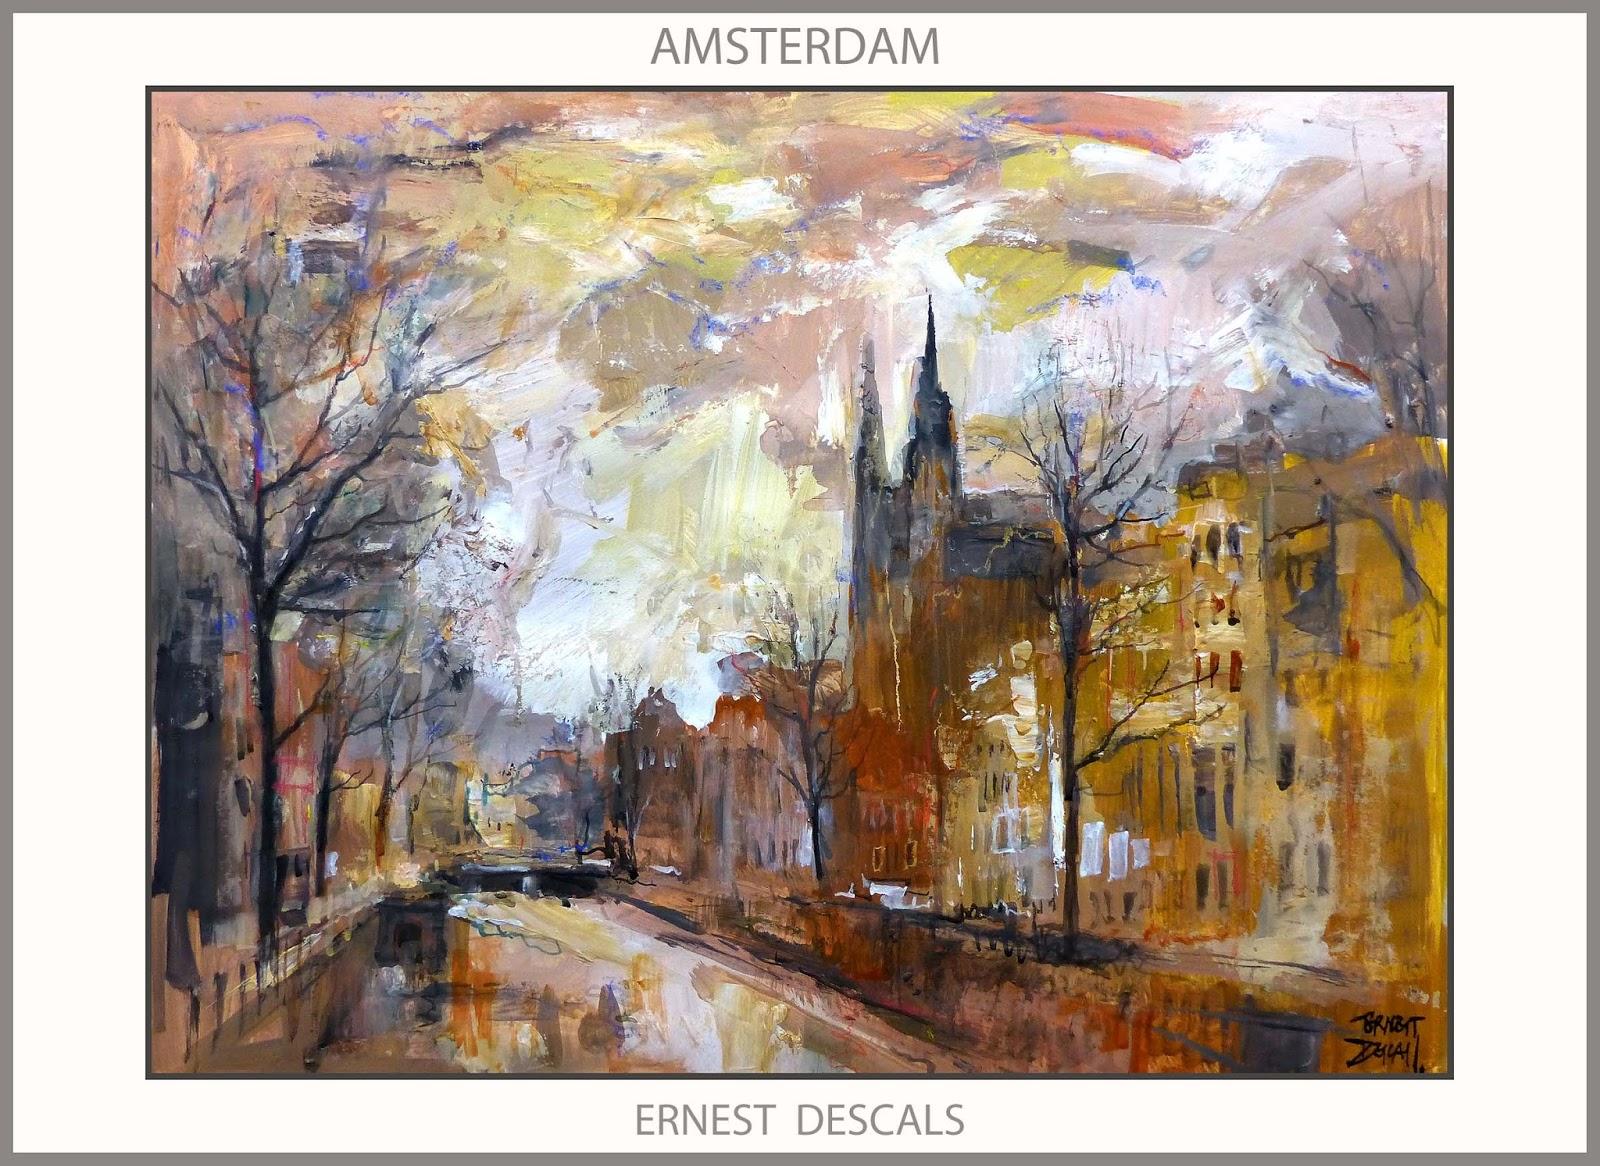 Ernest descals artista pintor amsterdam pintura paisajes - Cuadros de pintura ...